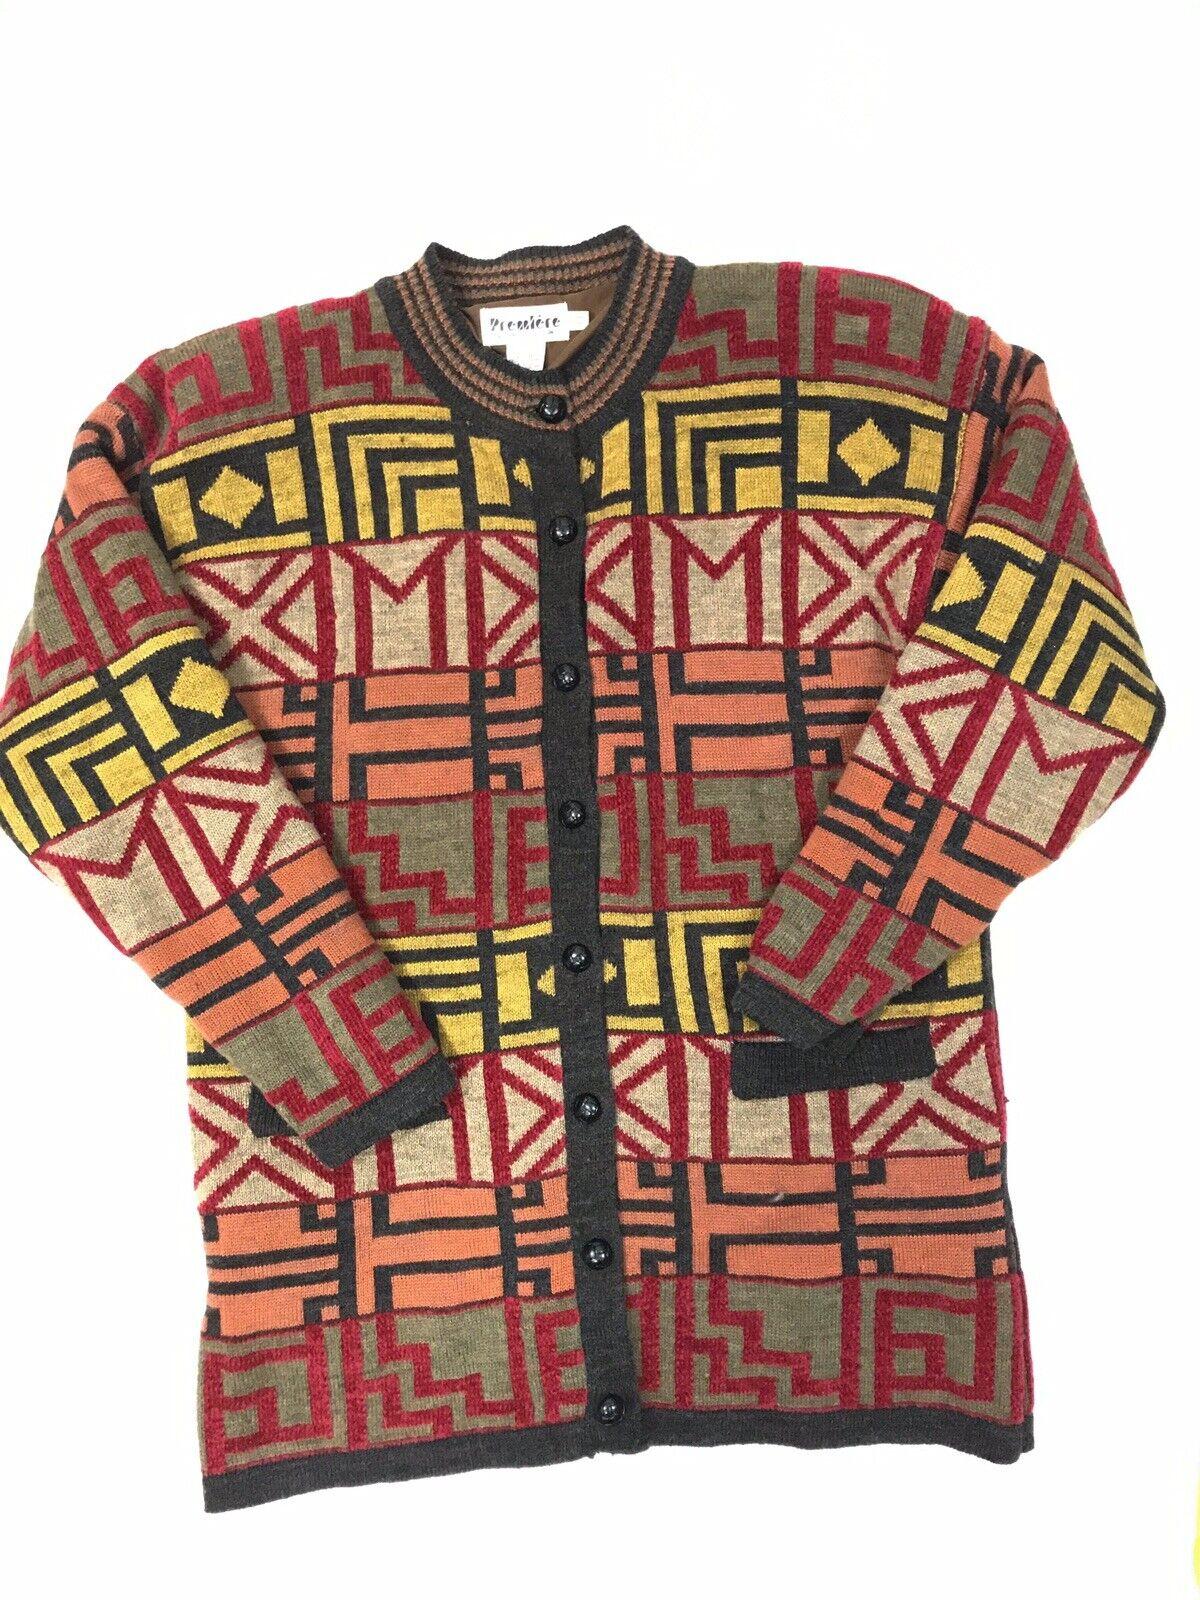 Vintage Premiere Small Sweater Coat Lined Cardigan Southwestern Geometric Aztec